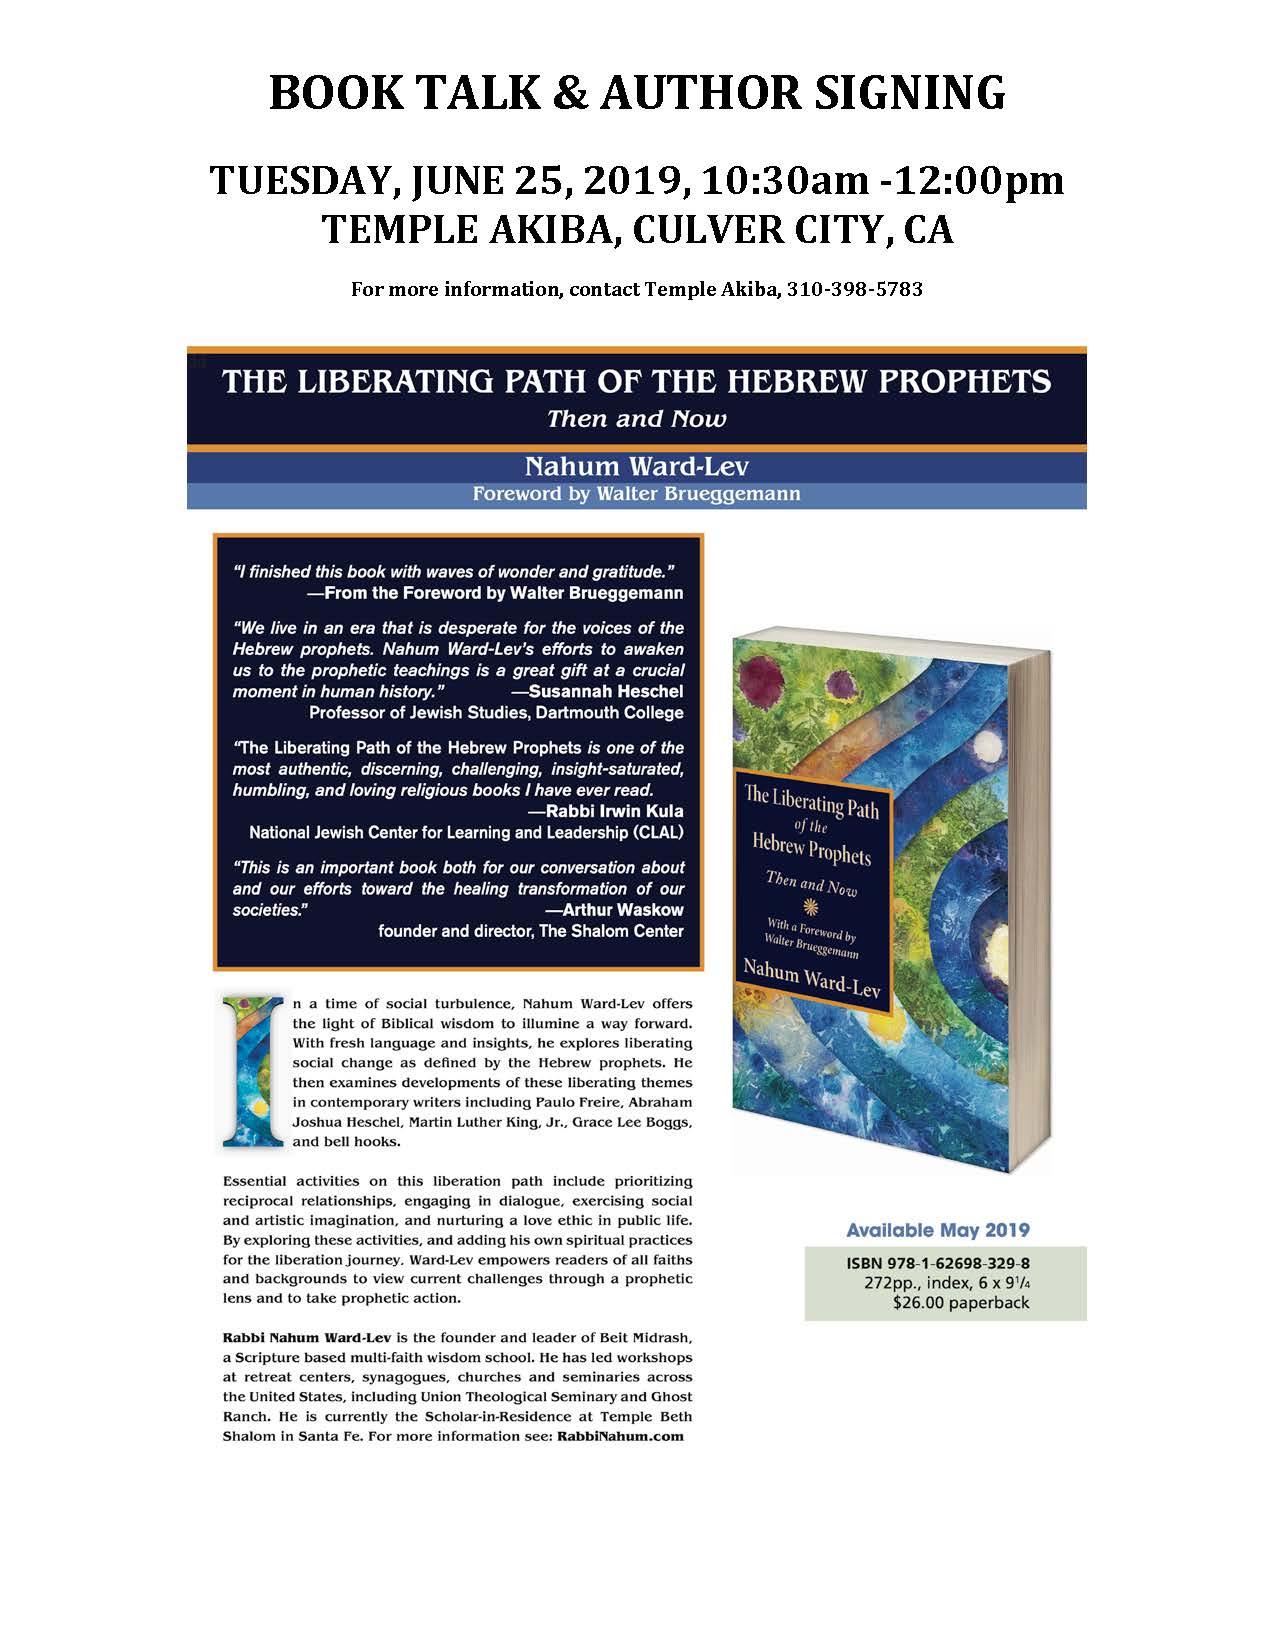 BOOK TALK Temple Akiba June 25 2019.jpg